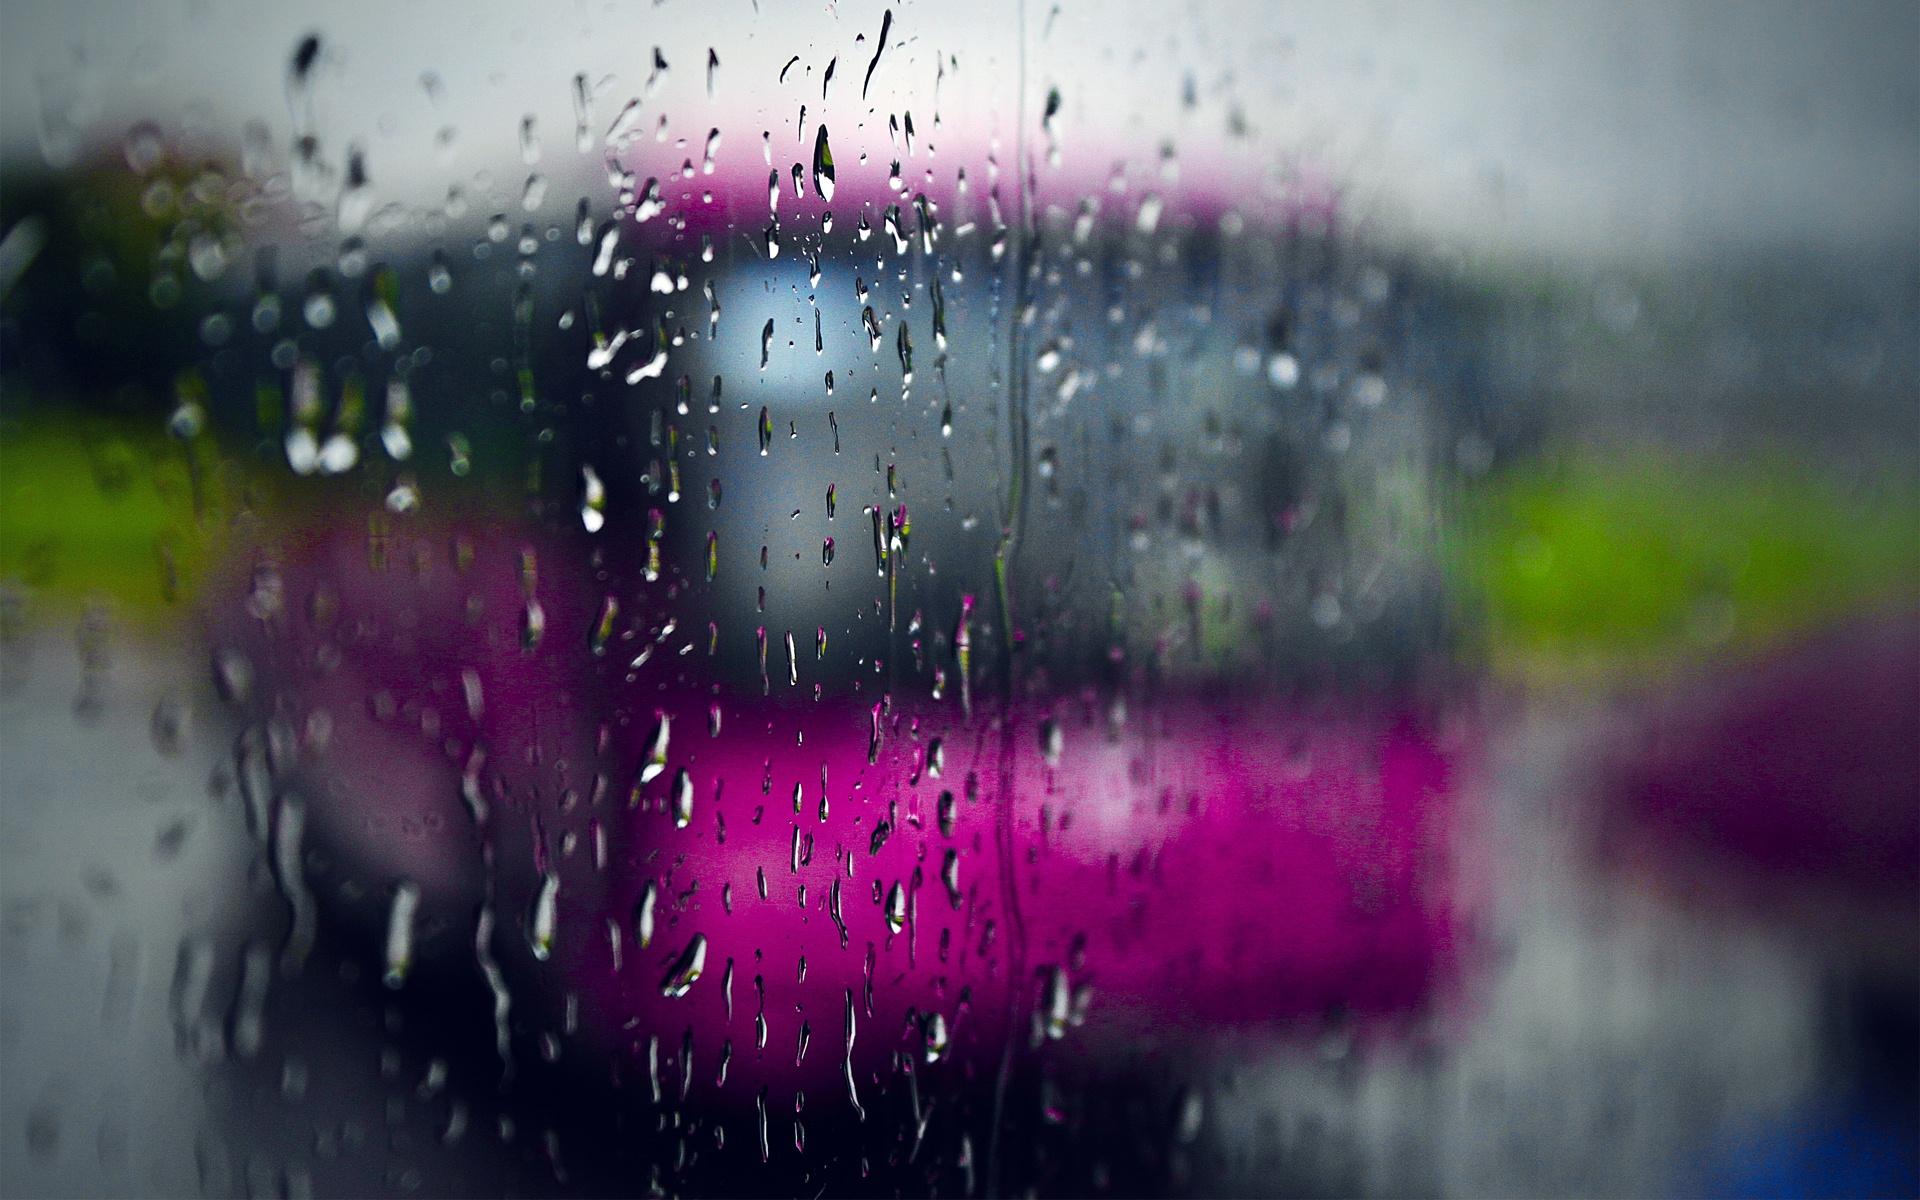 the rain rain forest images rain at beach screensavers etc 1920x1200